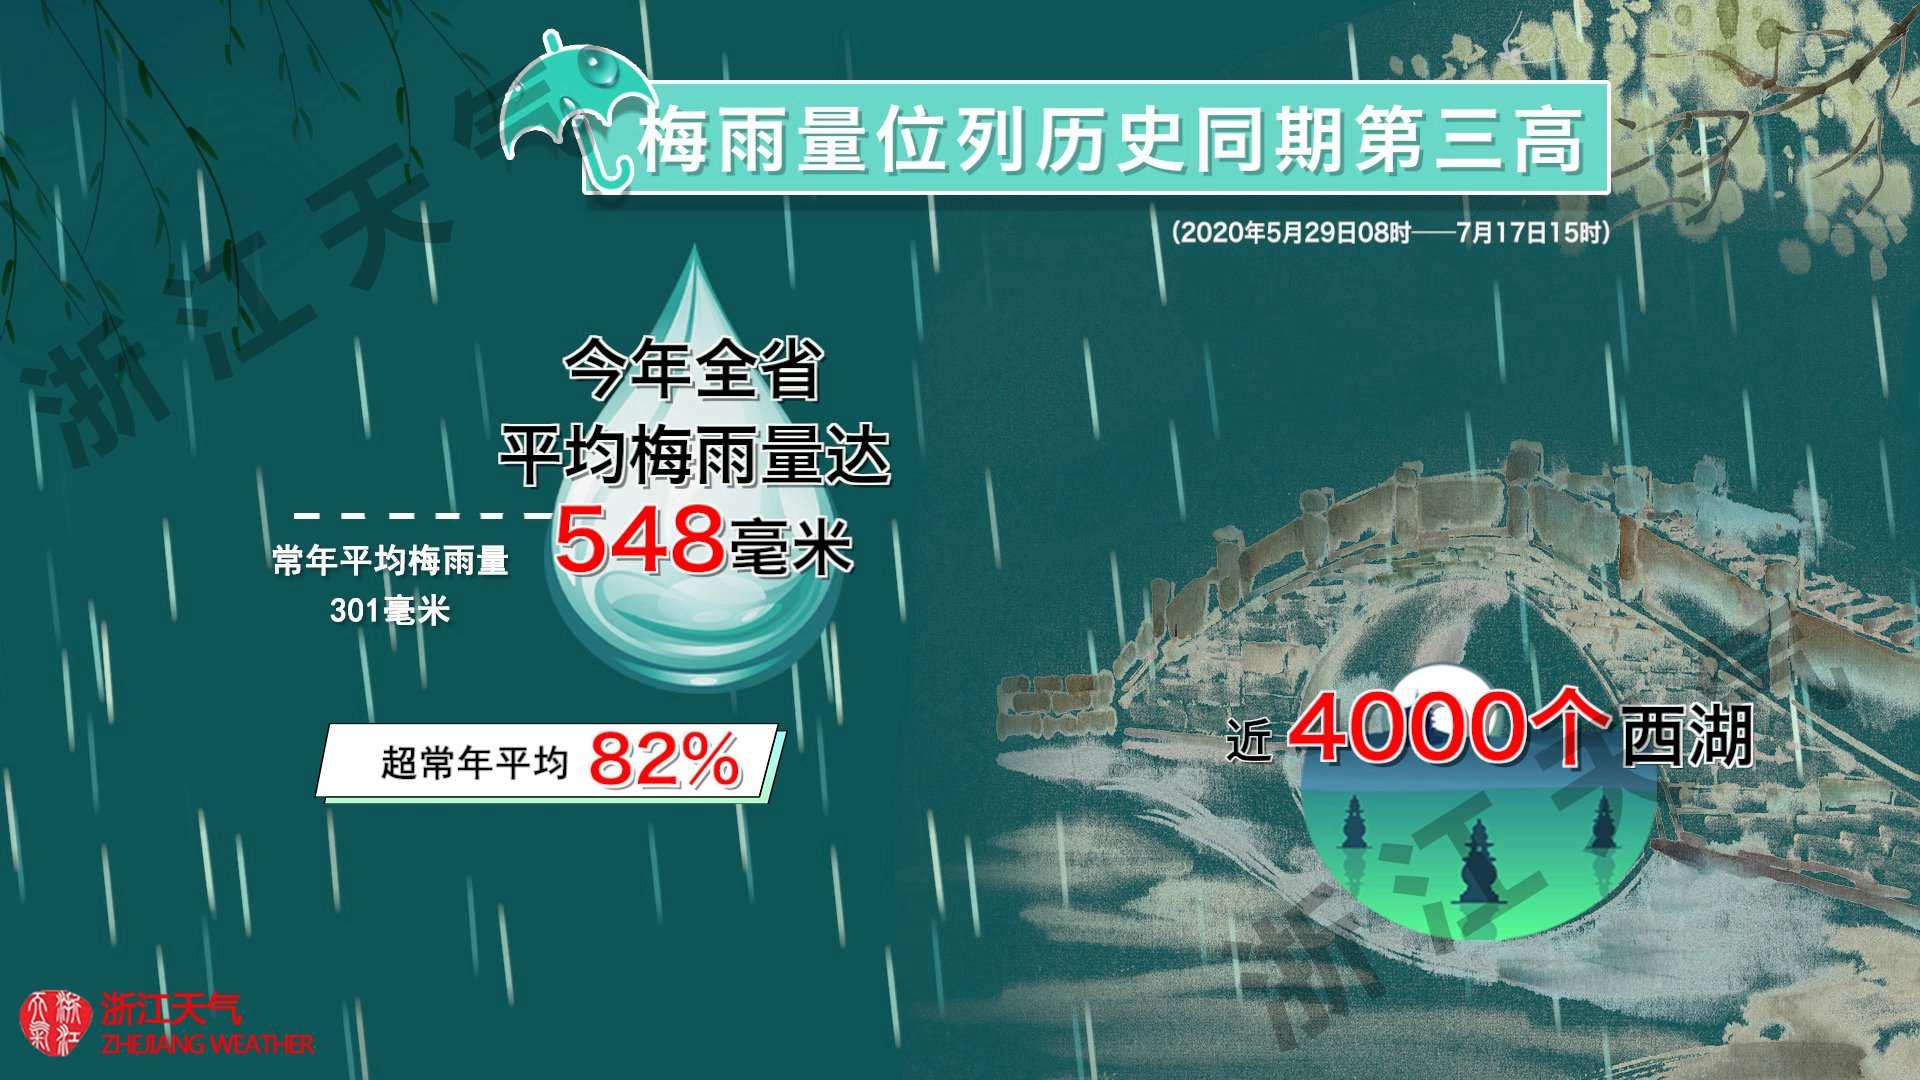 http://i.weather.com.cn/images/zhejiang1/rdzt/2020/07/19/1595150618258033031.jpg